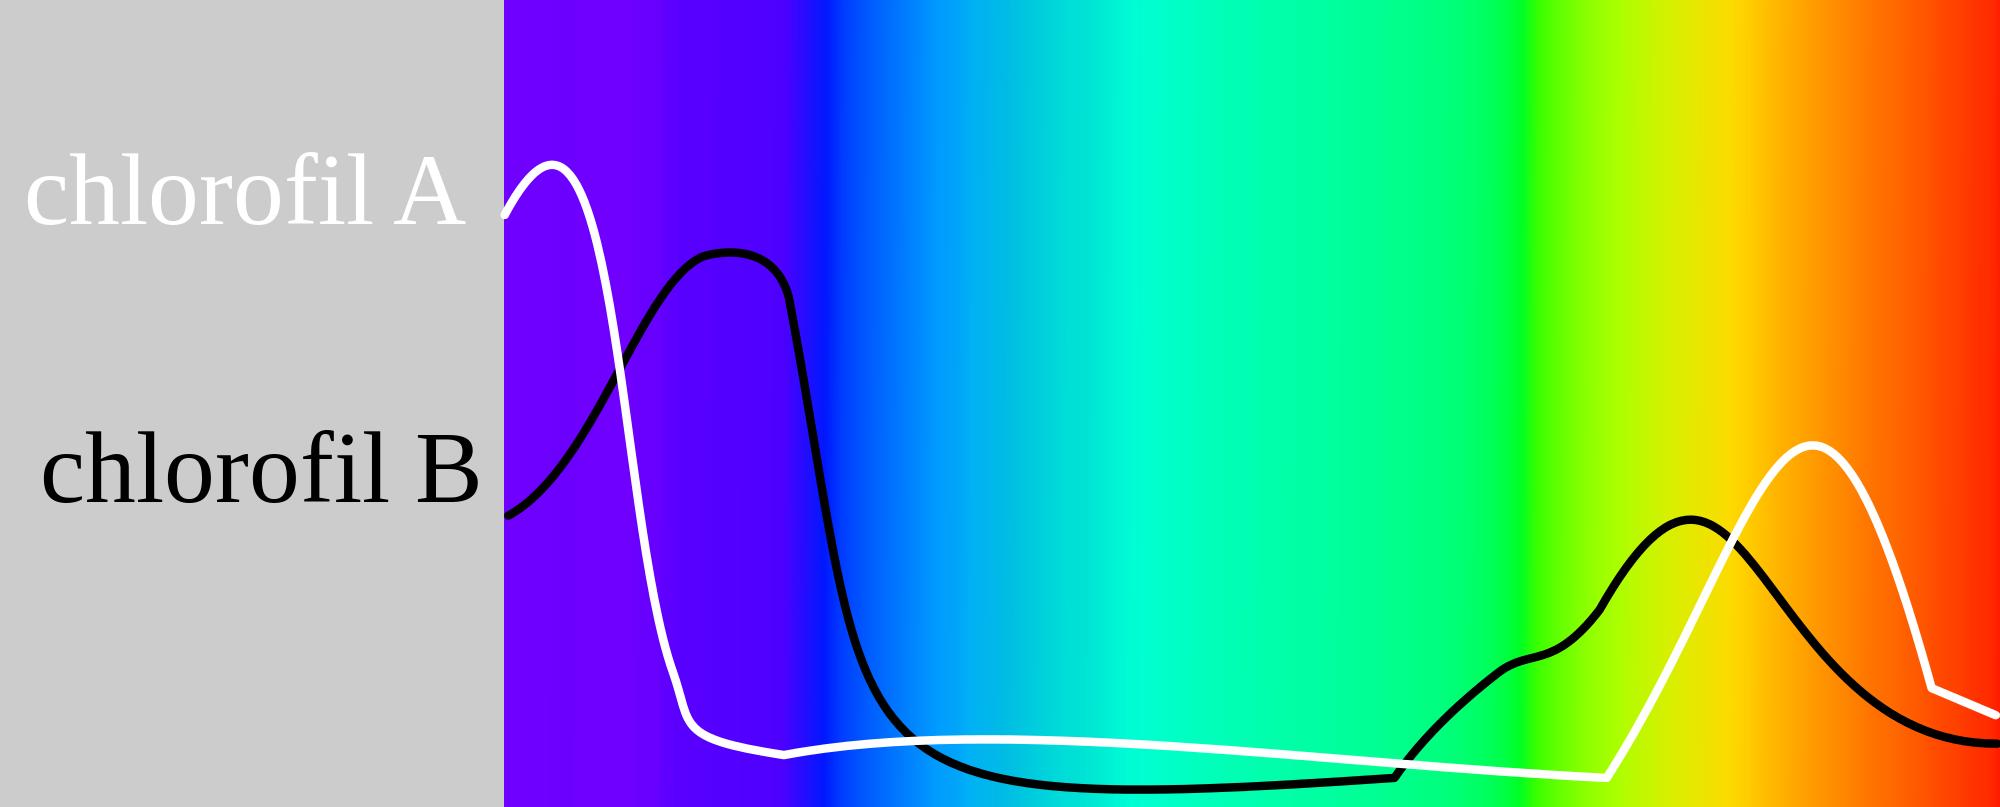 WholeDude-WholeDesigner-Chlorophyll: The light absorption spectra of Cholorophyll molecules.